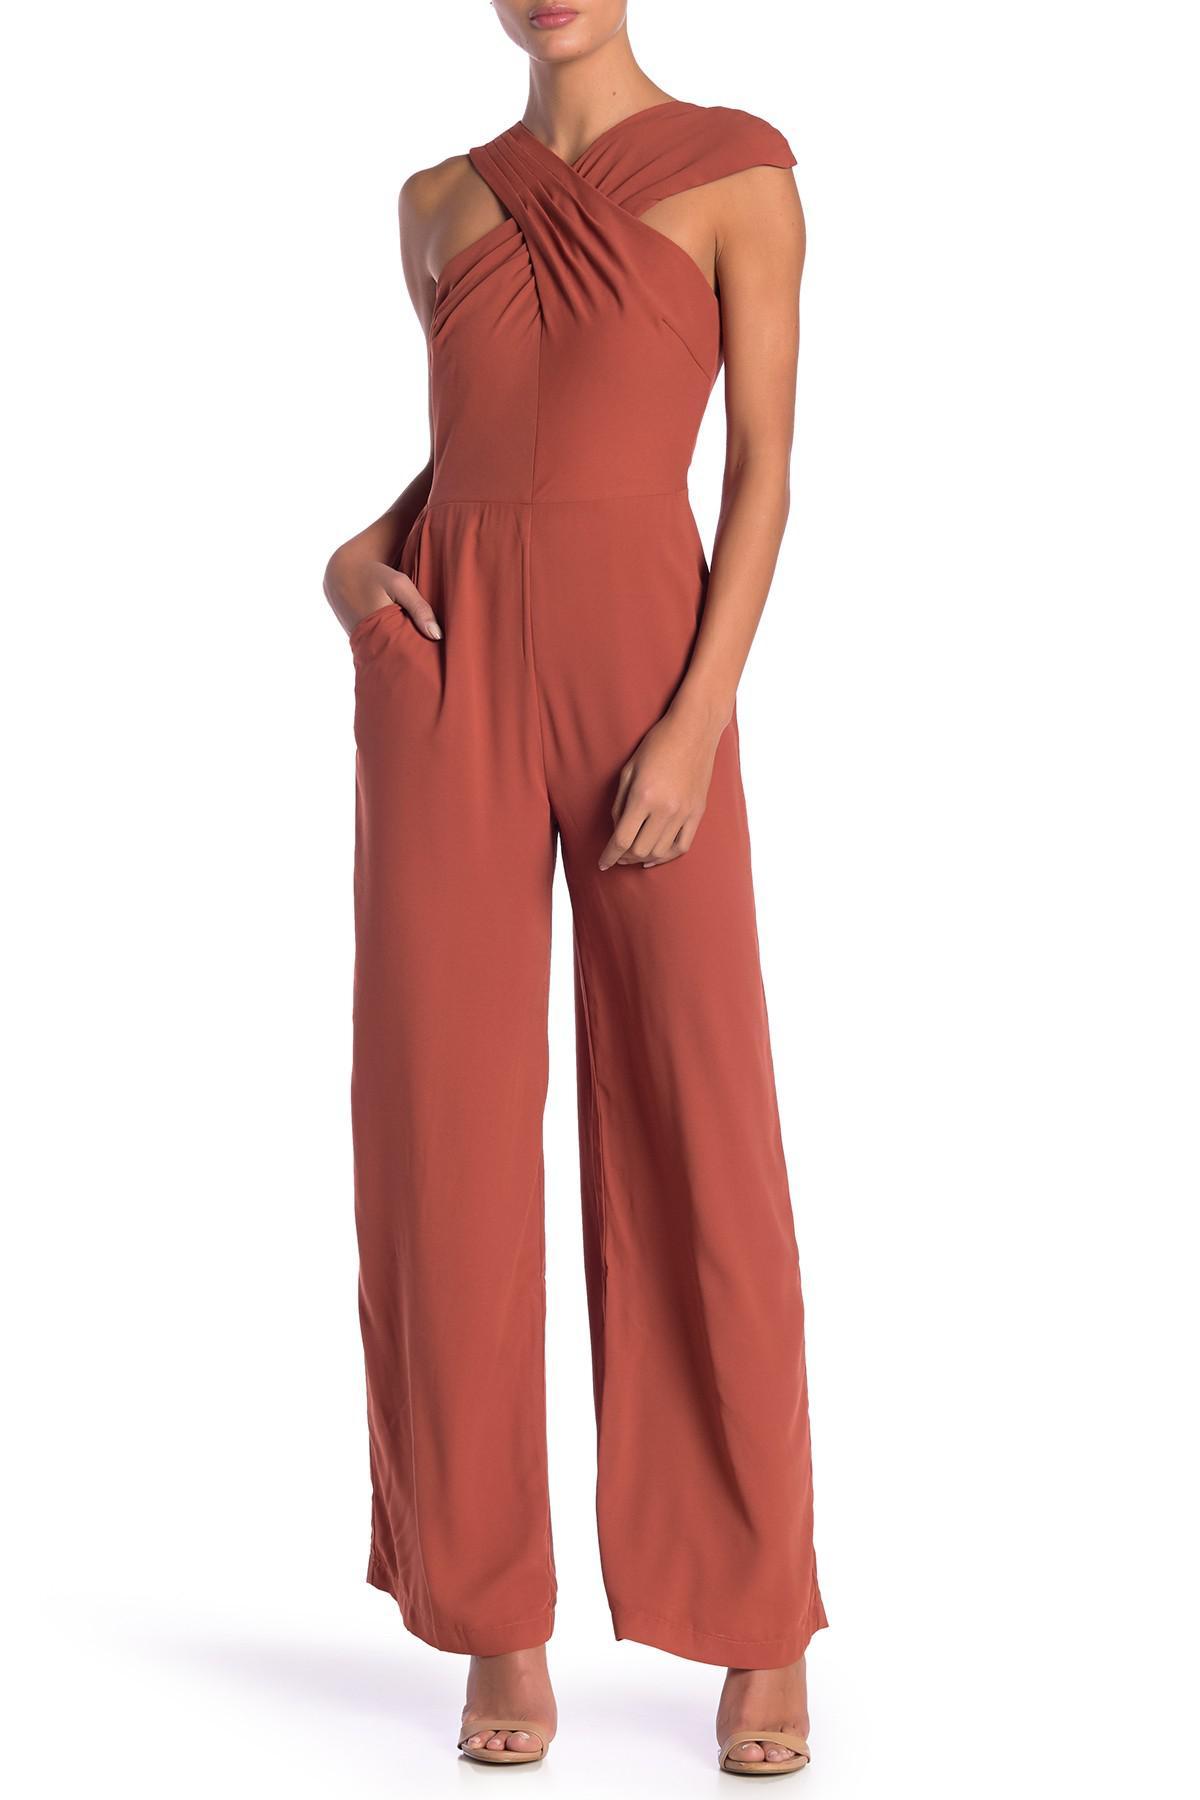 ef7fb902116 Lyst - Adelyn Rae Heidi Halter Jumpsuit in Red